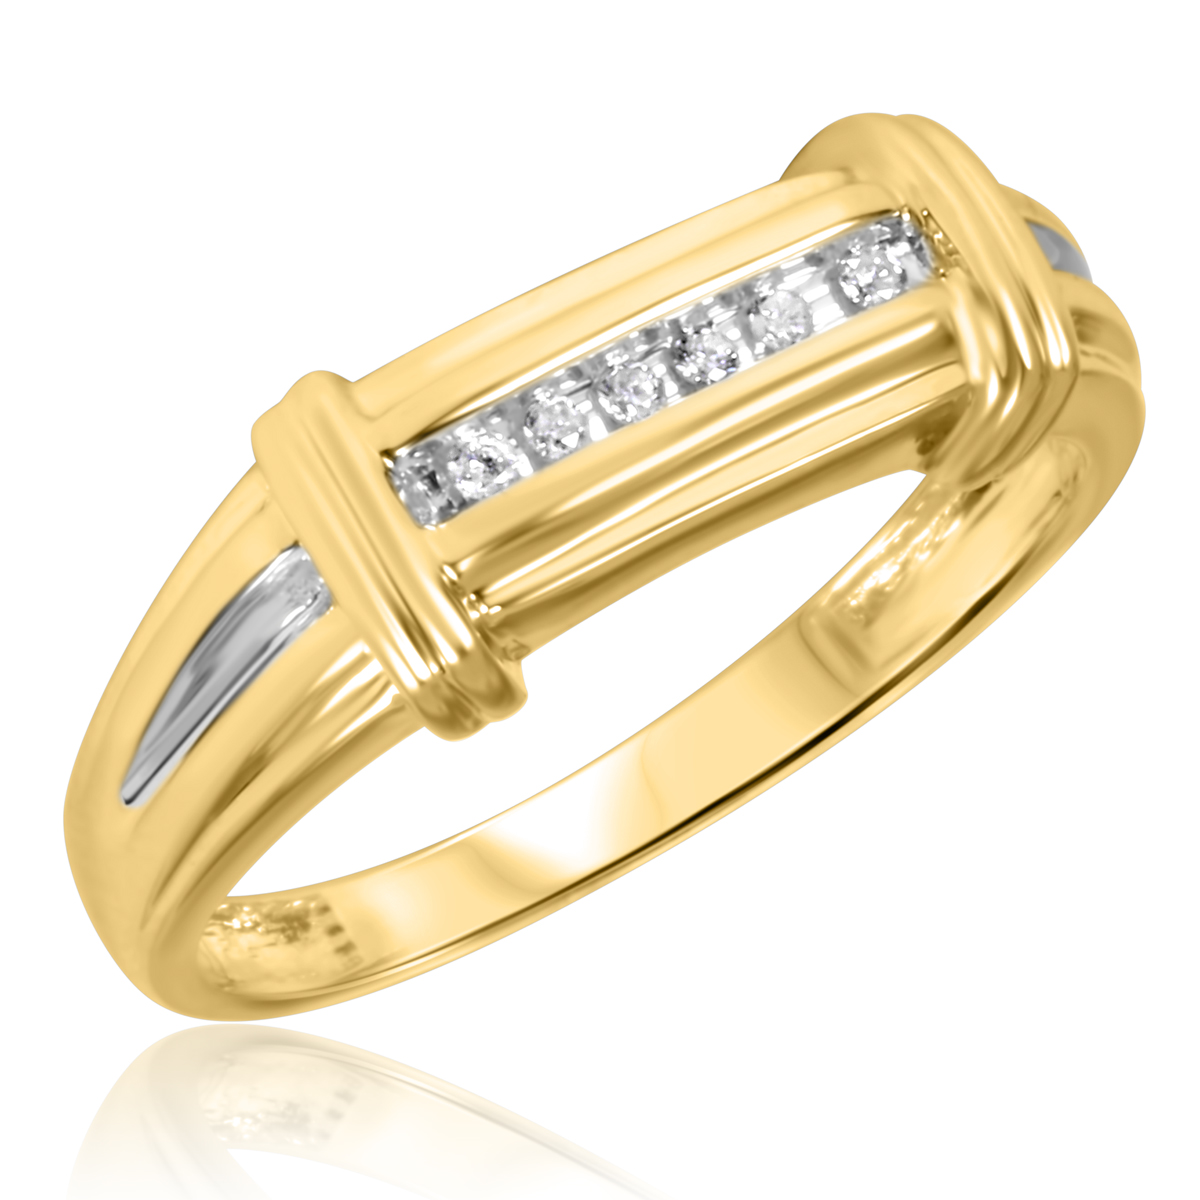 1/10 CT. T.W. Round Cut Diamond Men's Wedding Band 10K Yellow Gold- Size 8